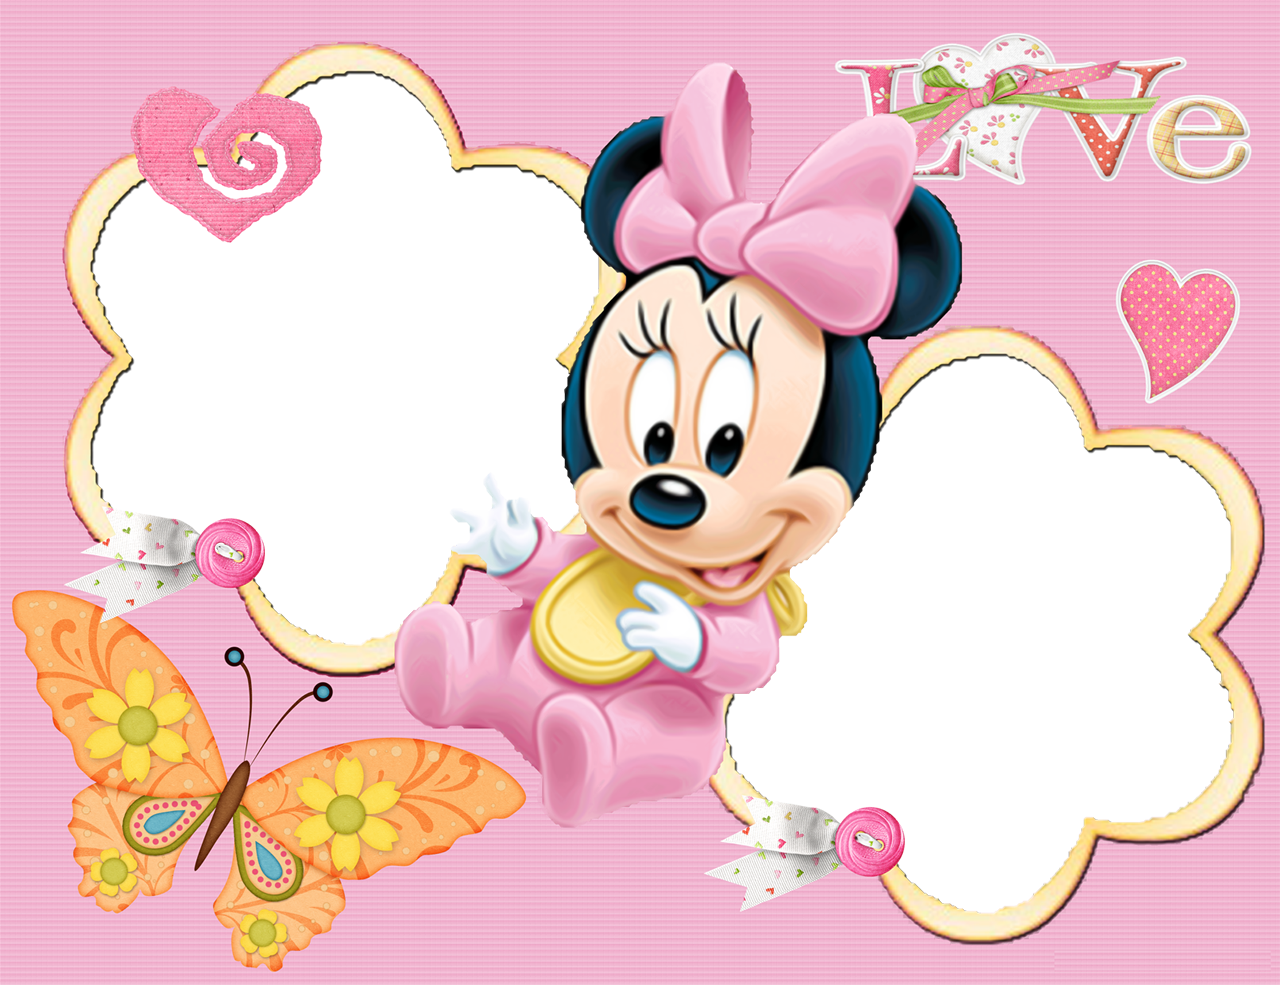 Dibujos de minni fotos. Disneyland clipart letterhead